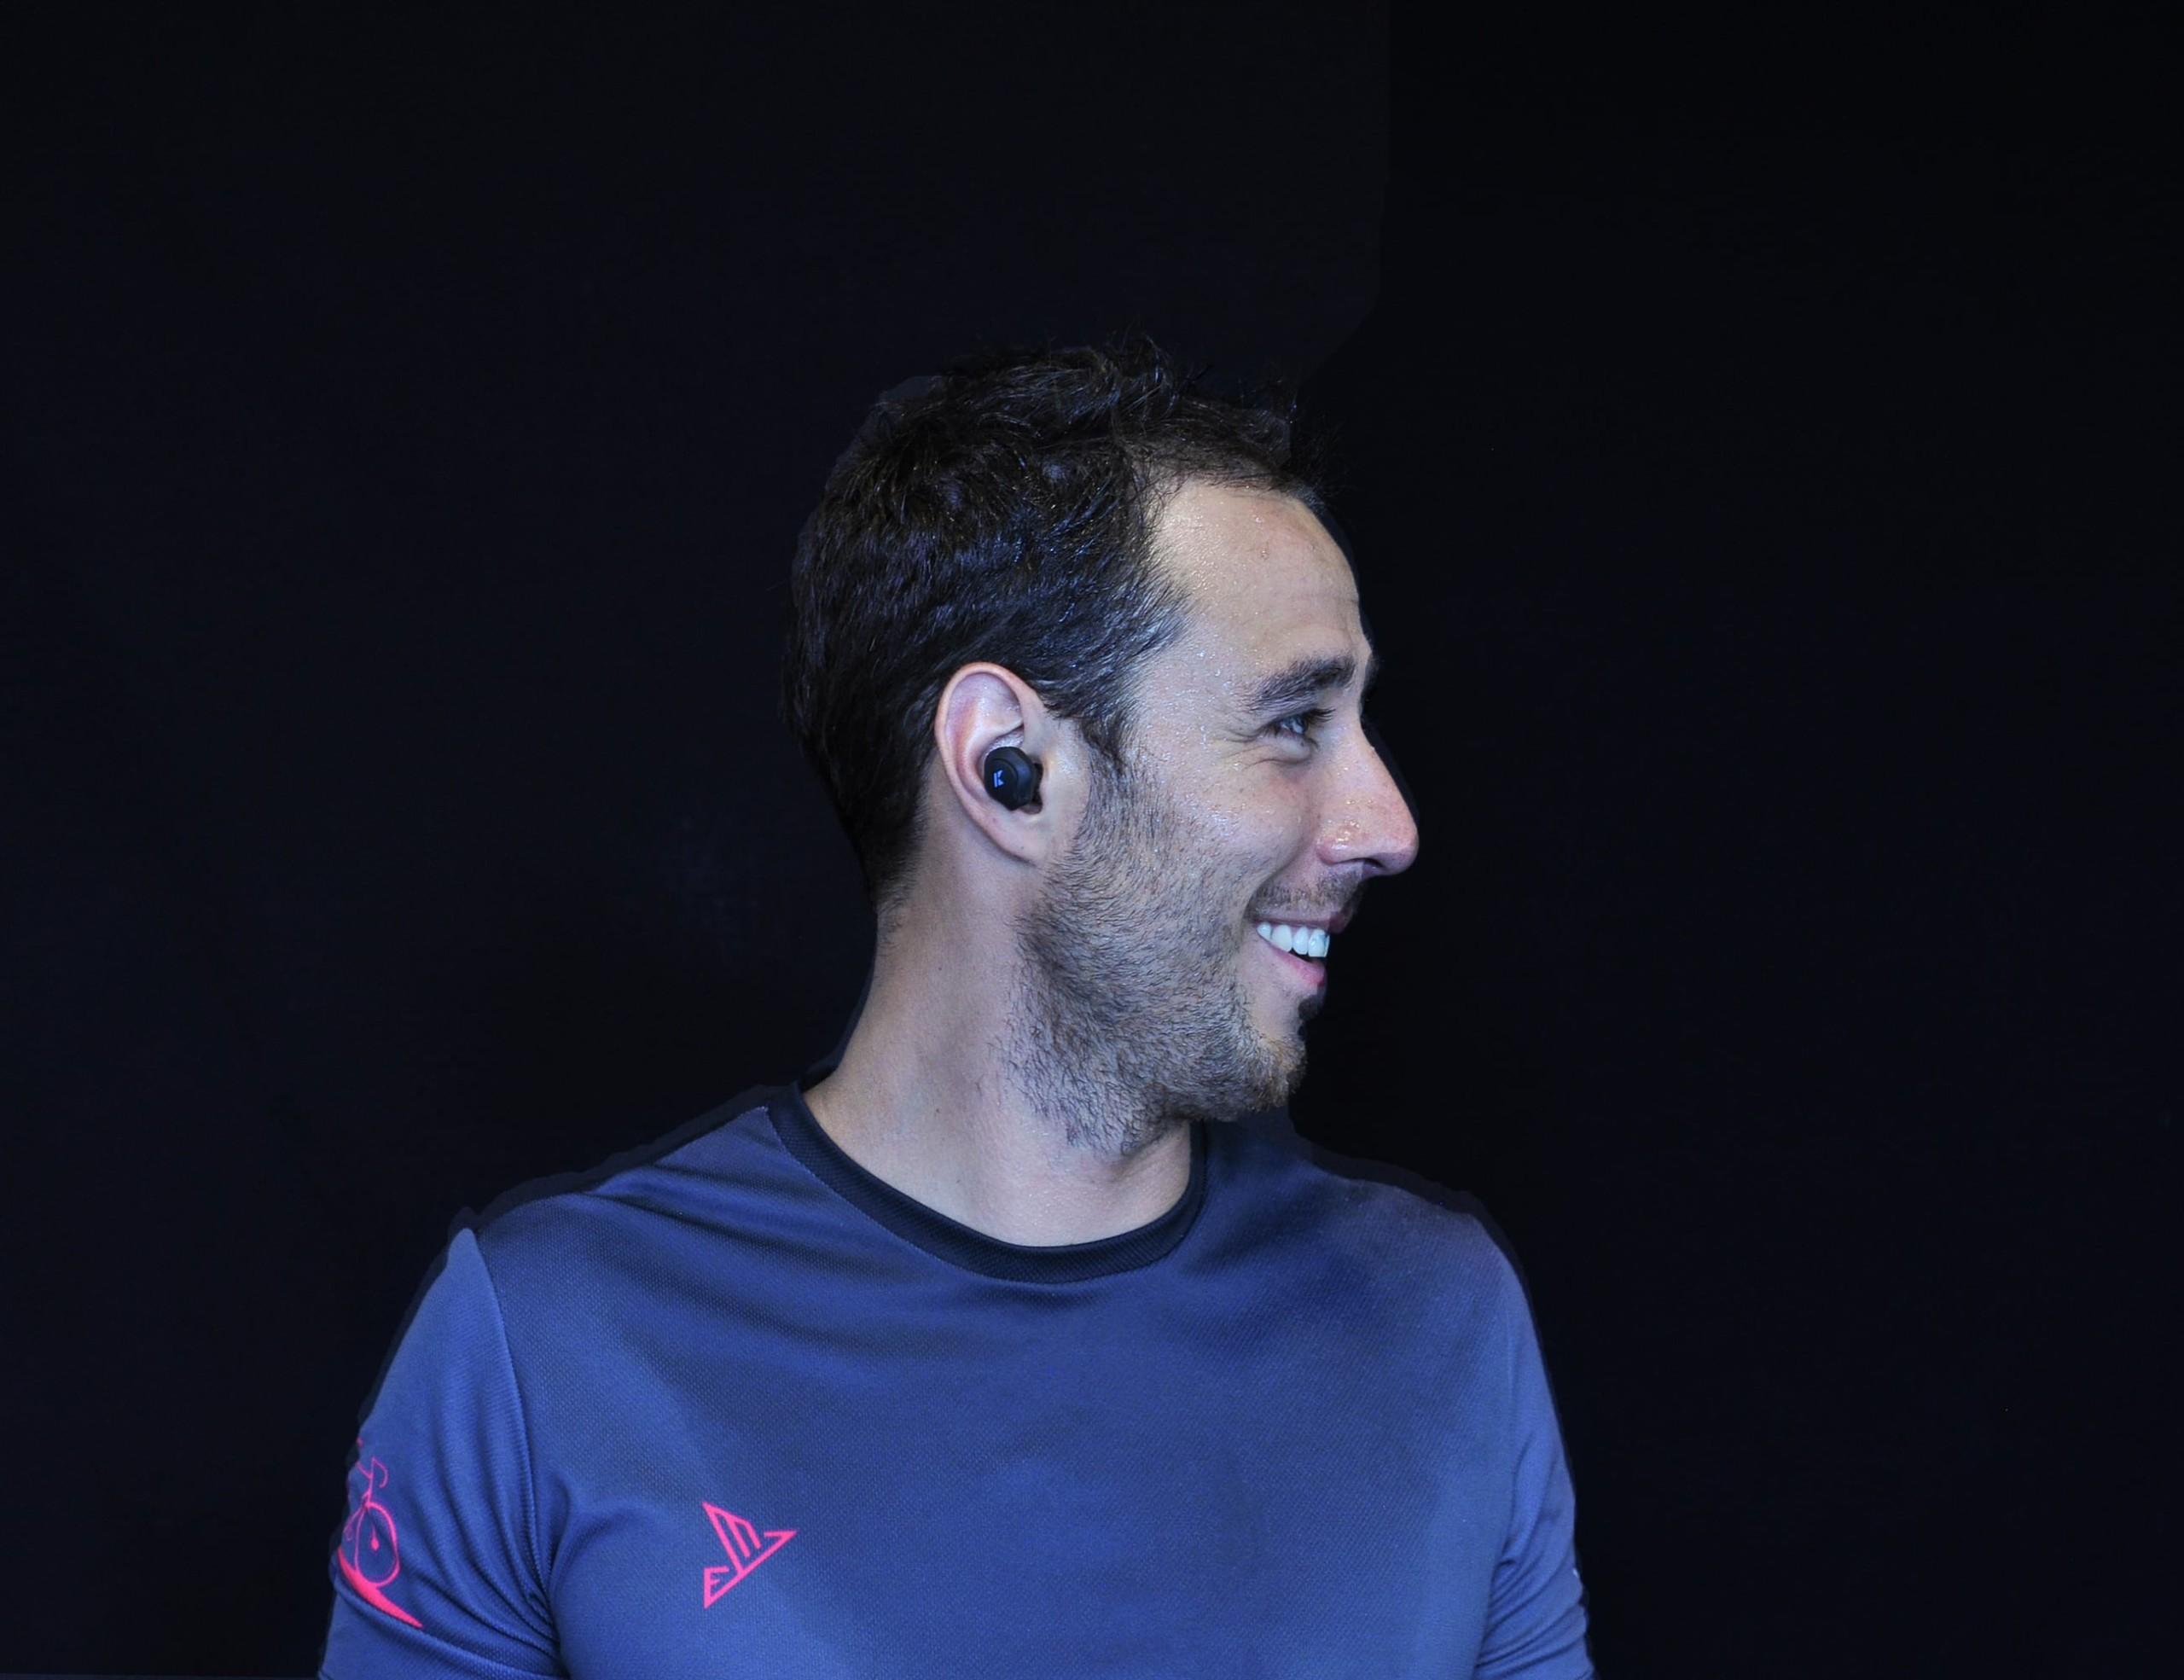 K Sport In-Ear Personal Trainer Headphones